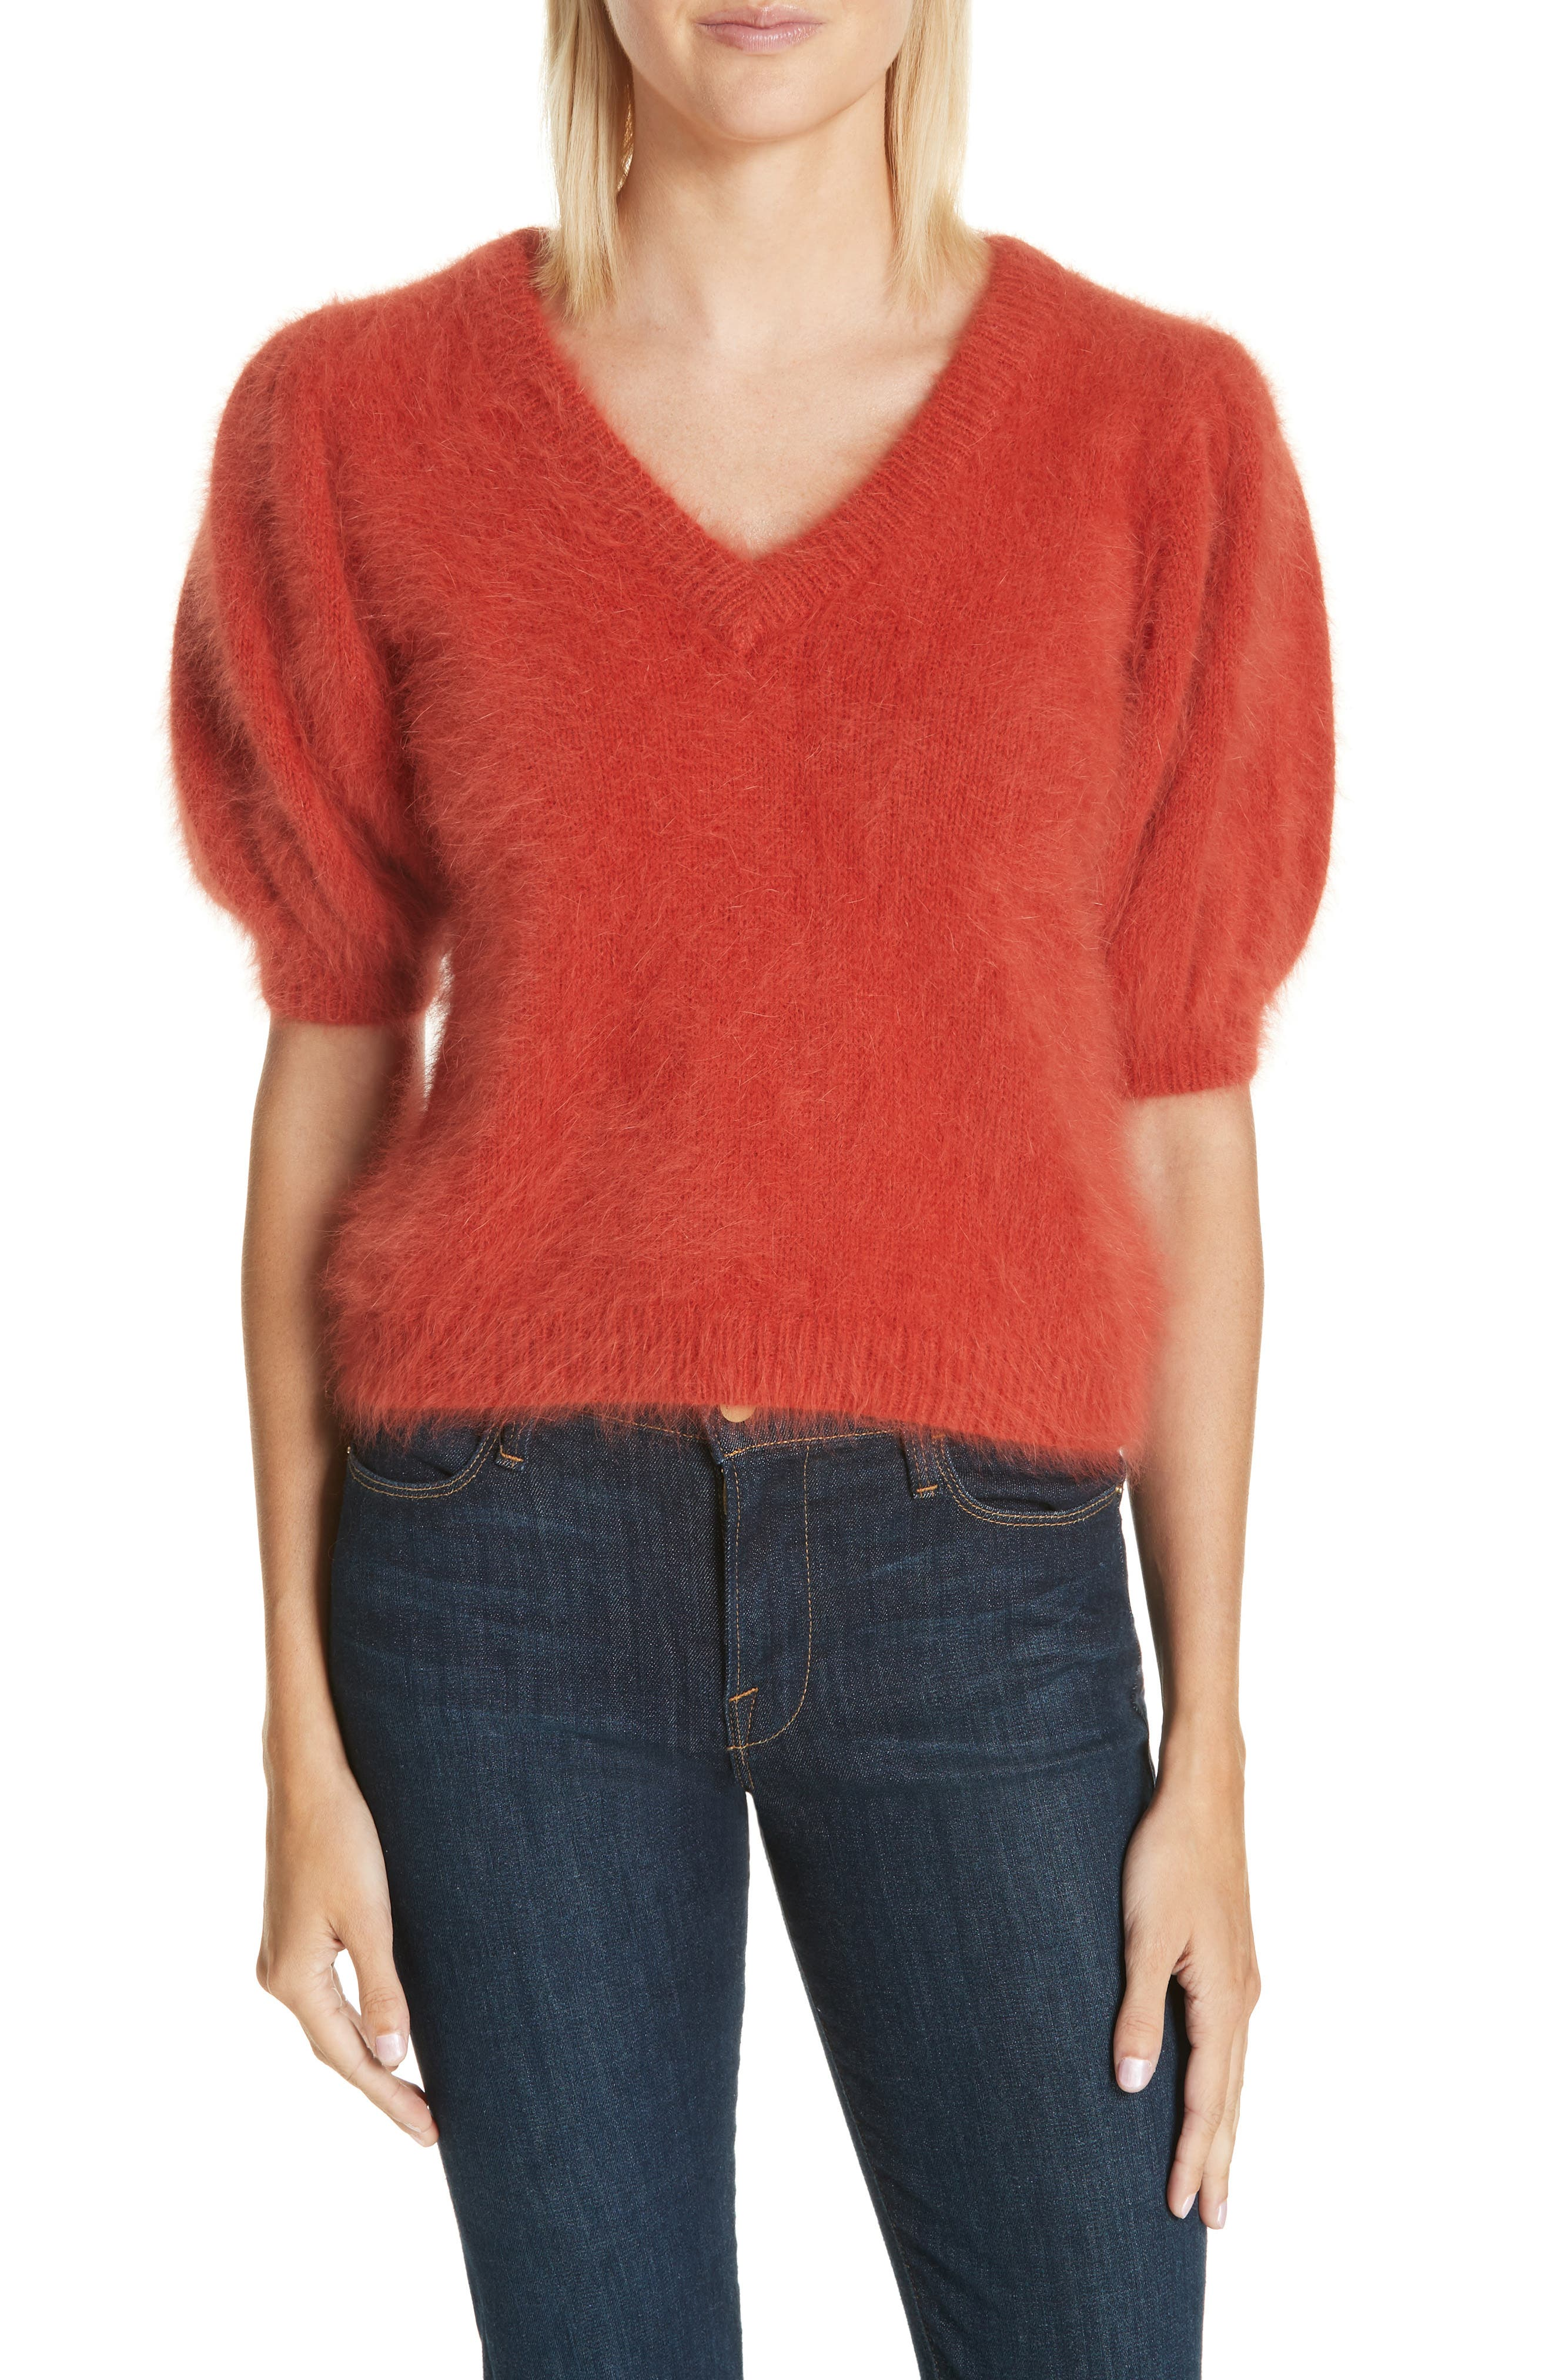 ULLA JOHNSON Aries Puff Sleeve Sweater, Main, color, 600